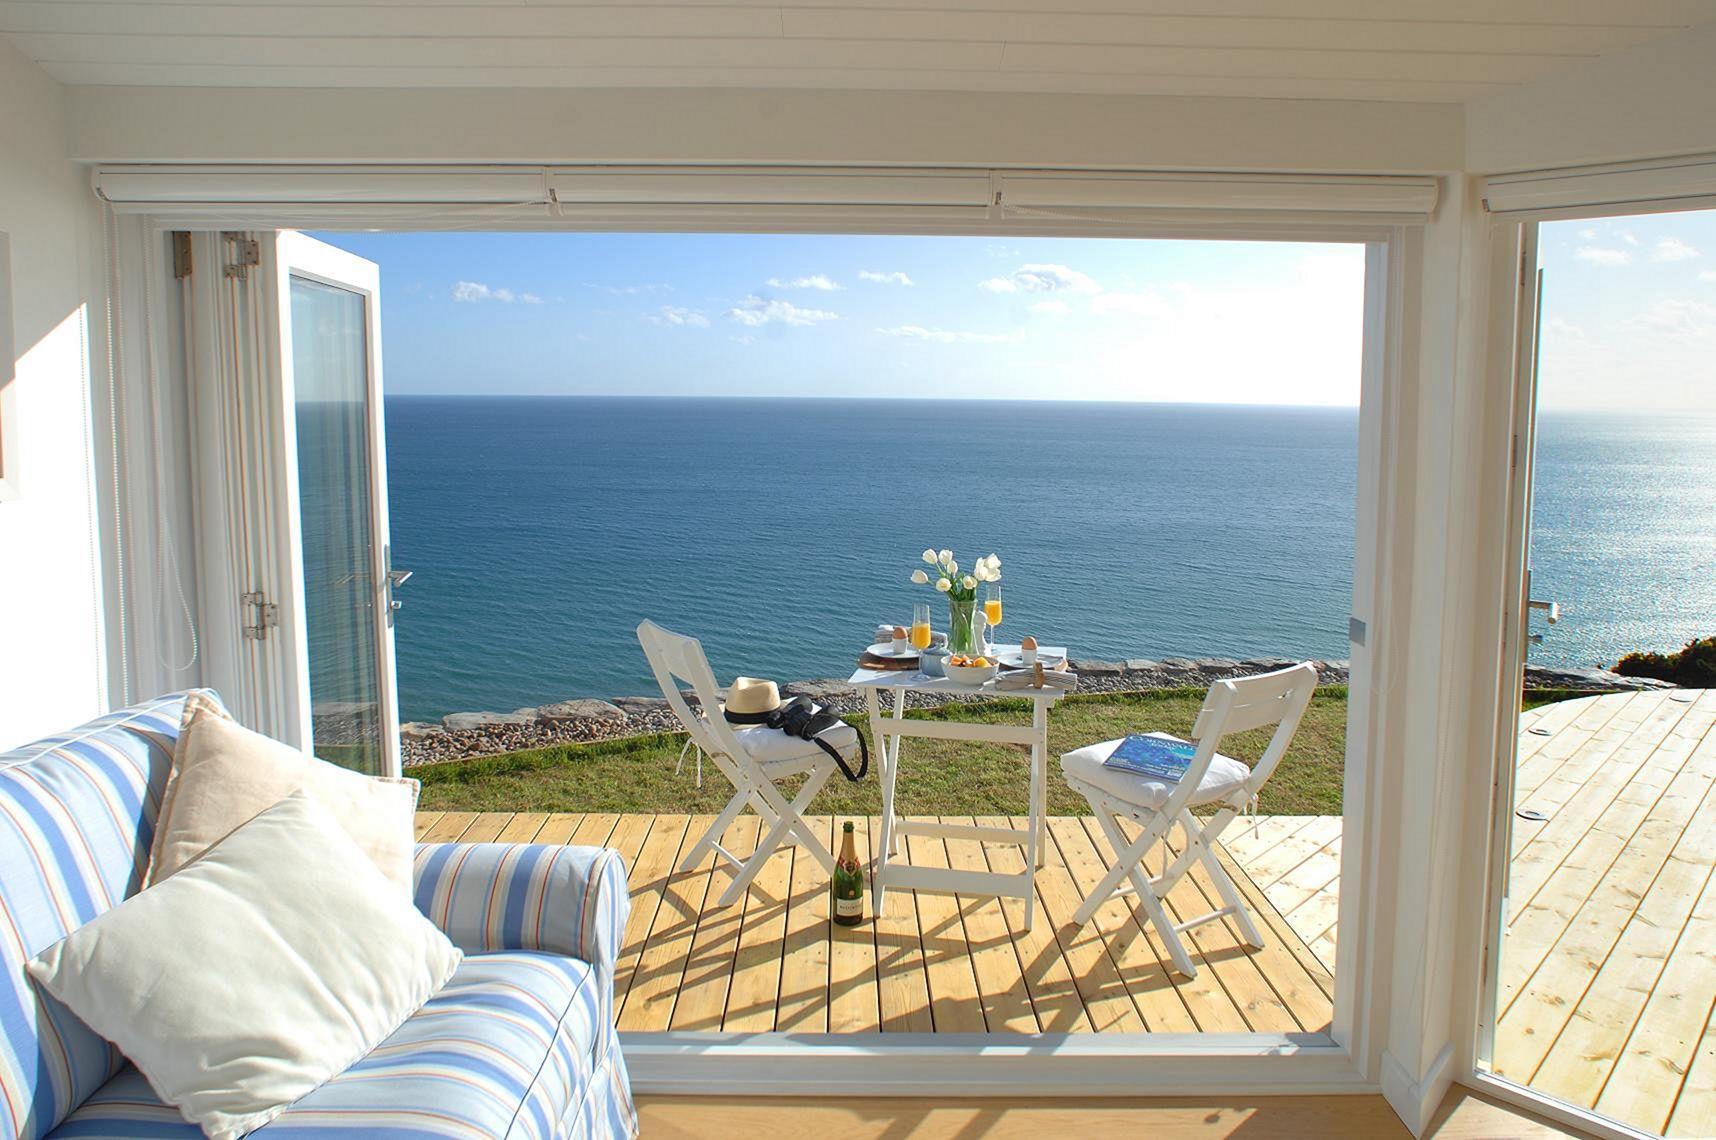 Beach Cottage Interior Design For Amazing Home inspiration 2